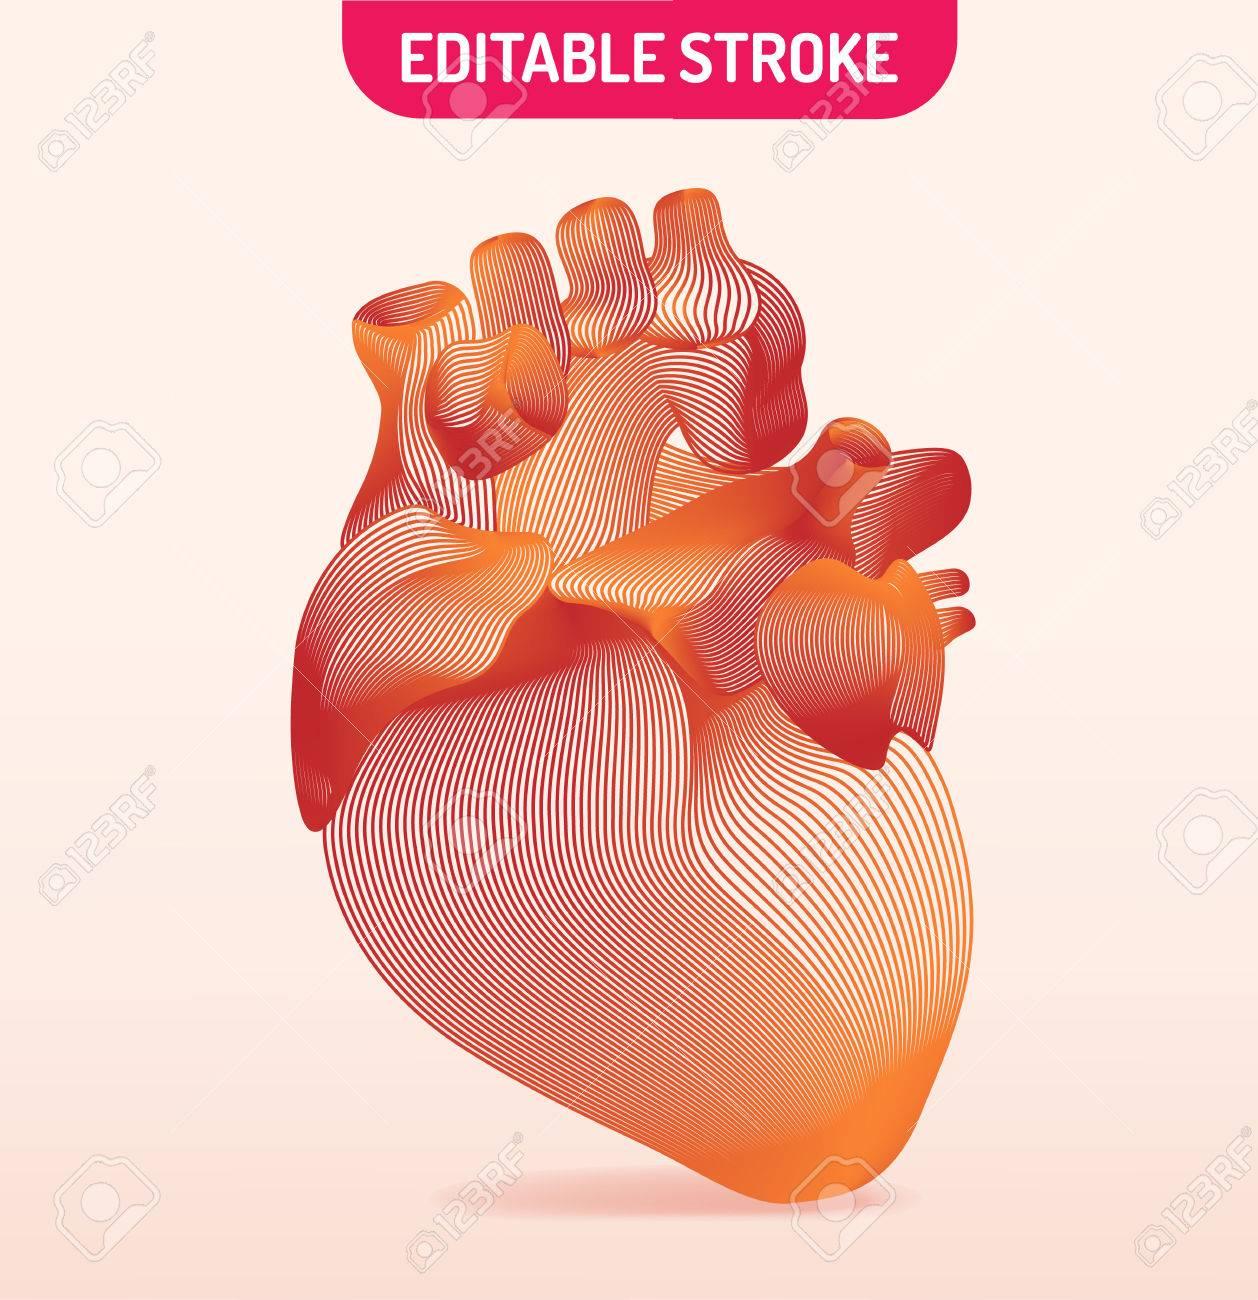 Line Art Of Human Anatomical Heart Vector Illustration Royalty